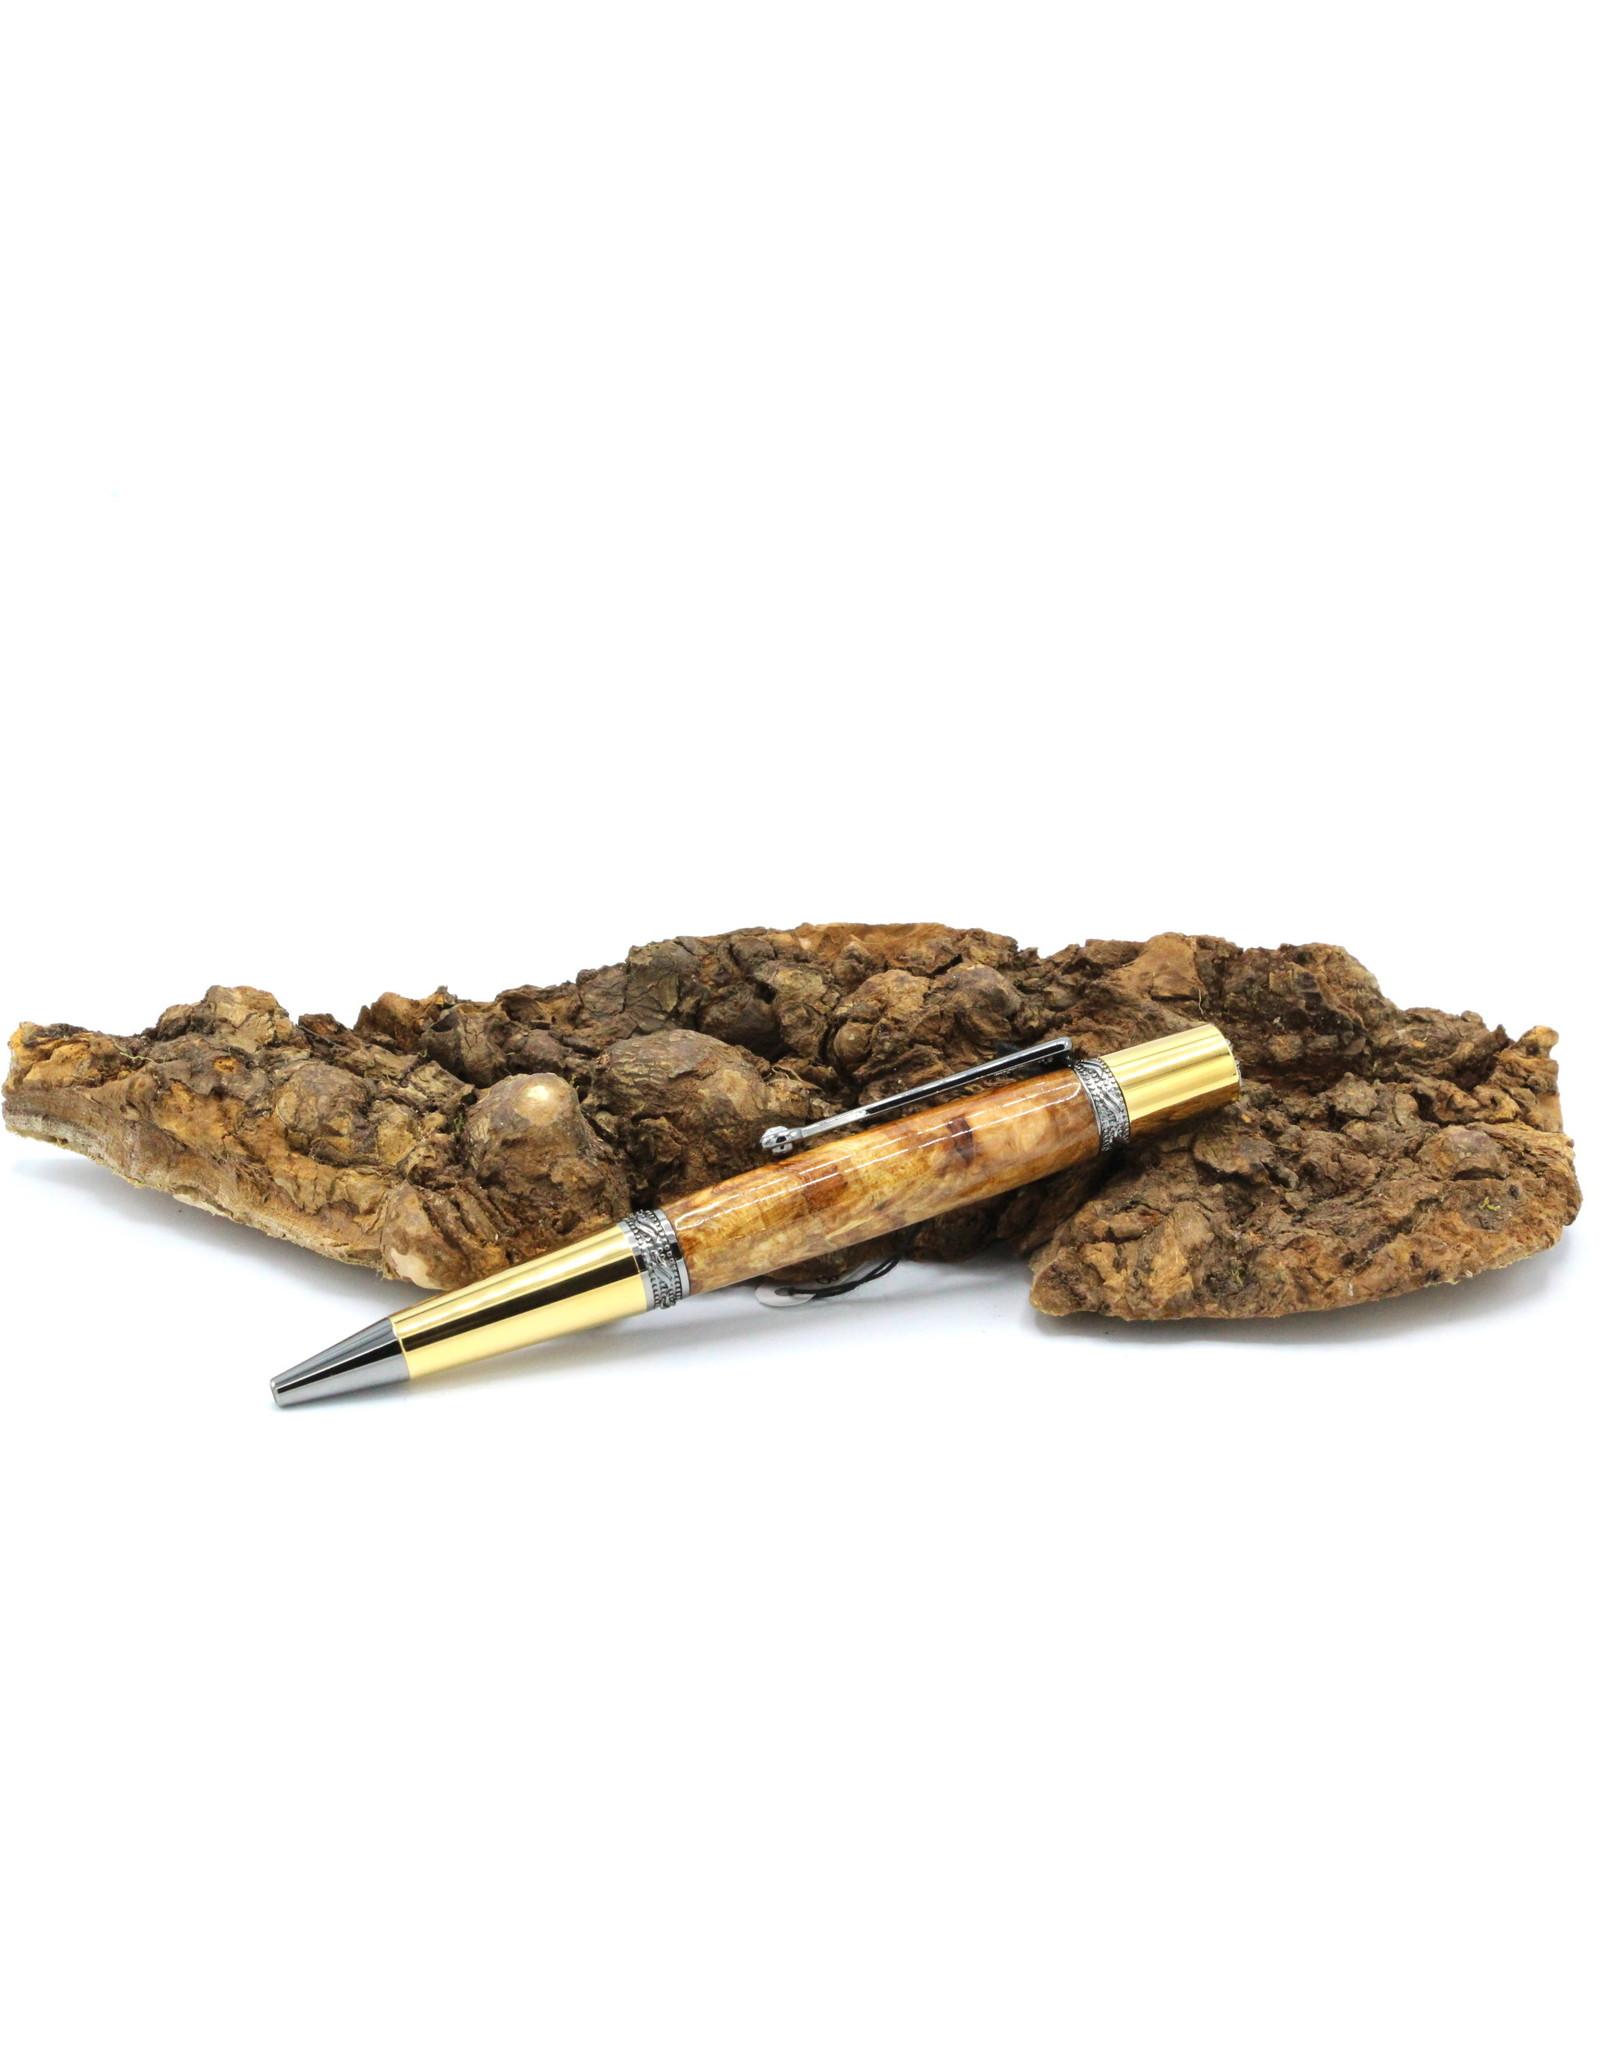 Maple Pen - Izar Maple Gold